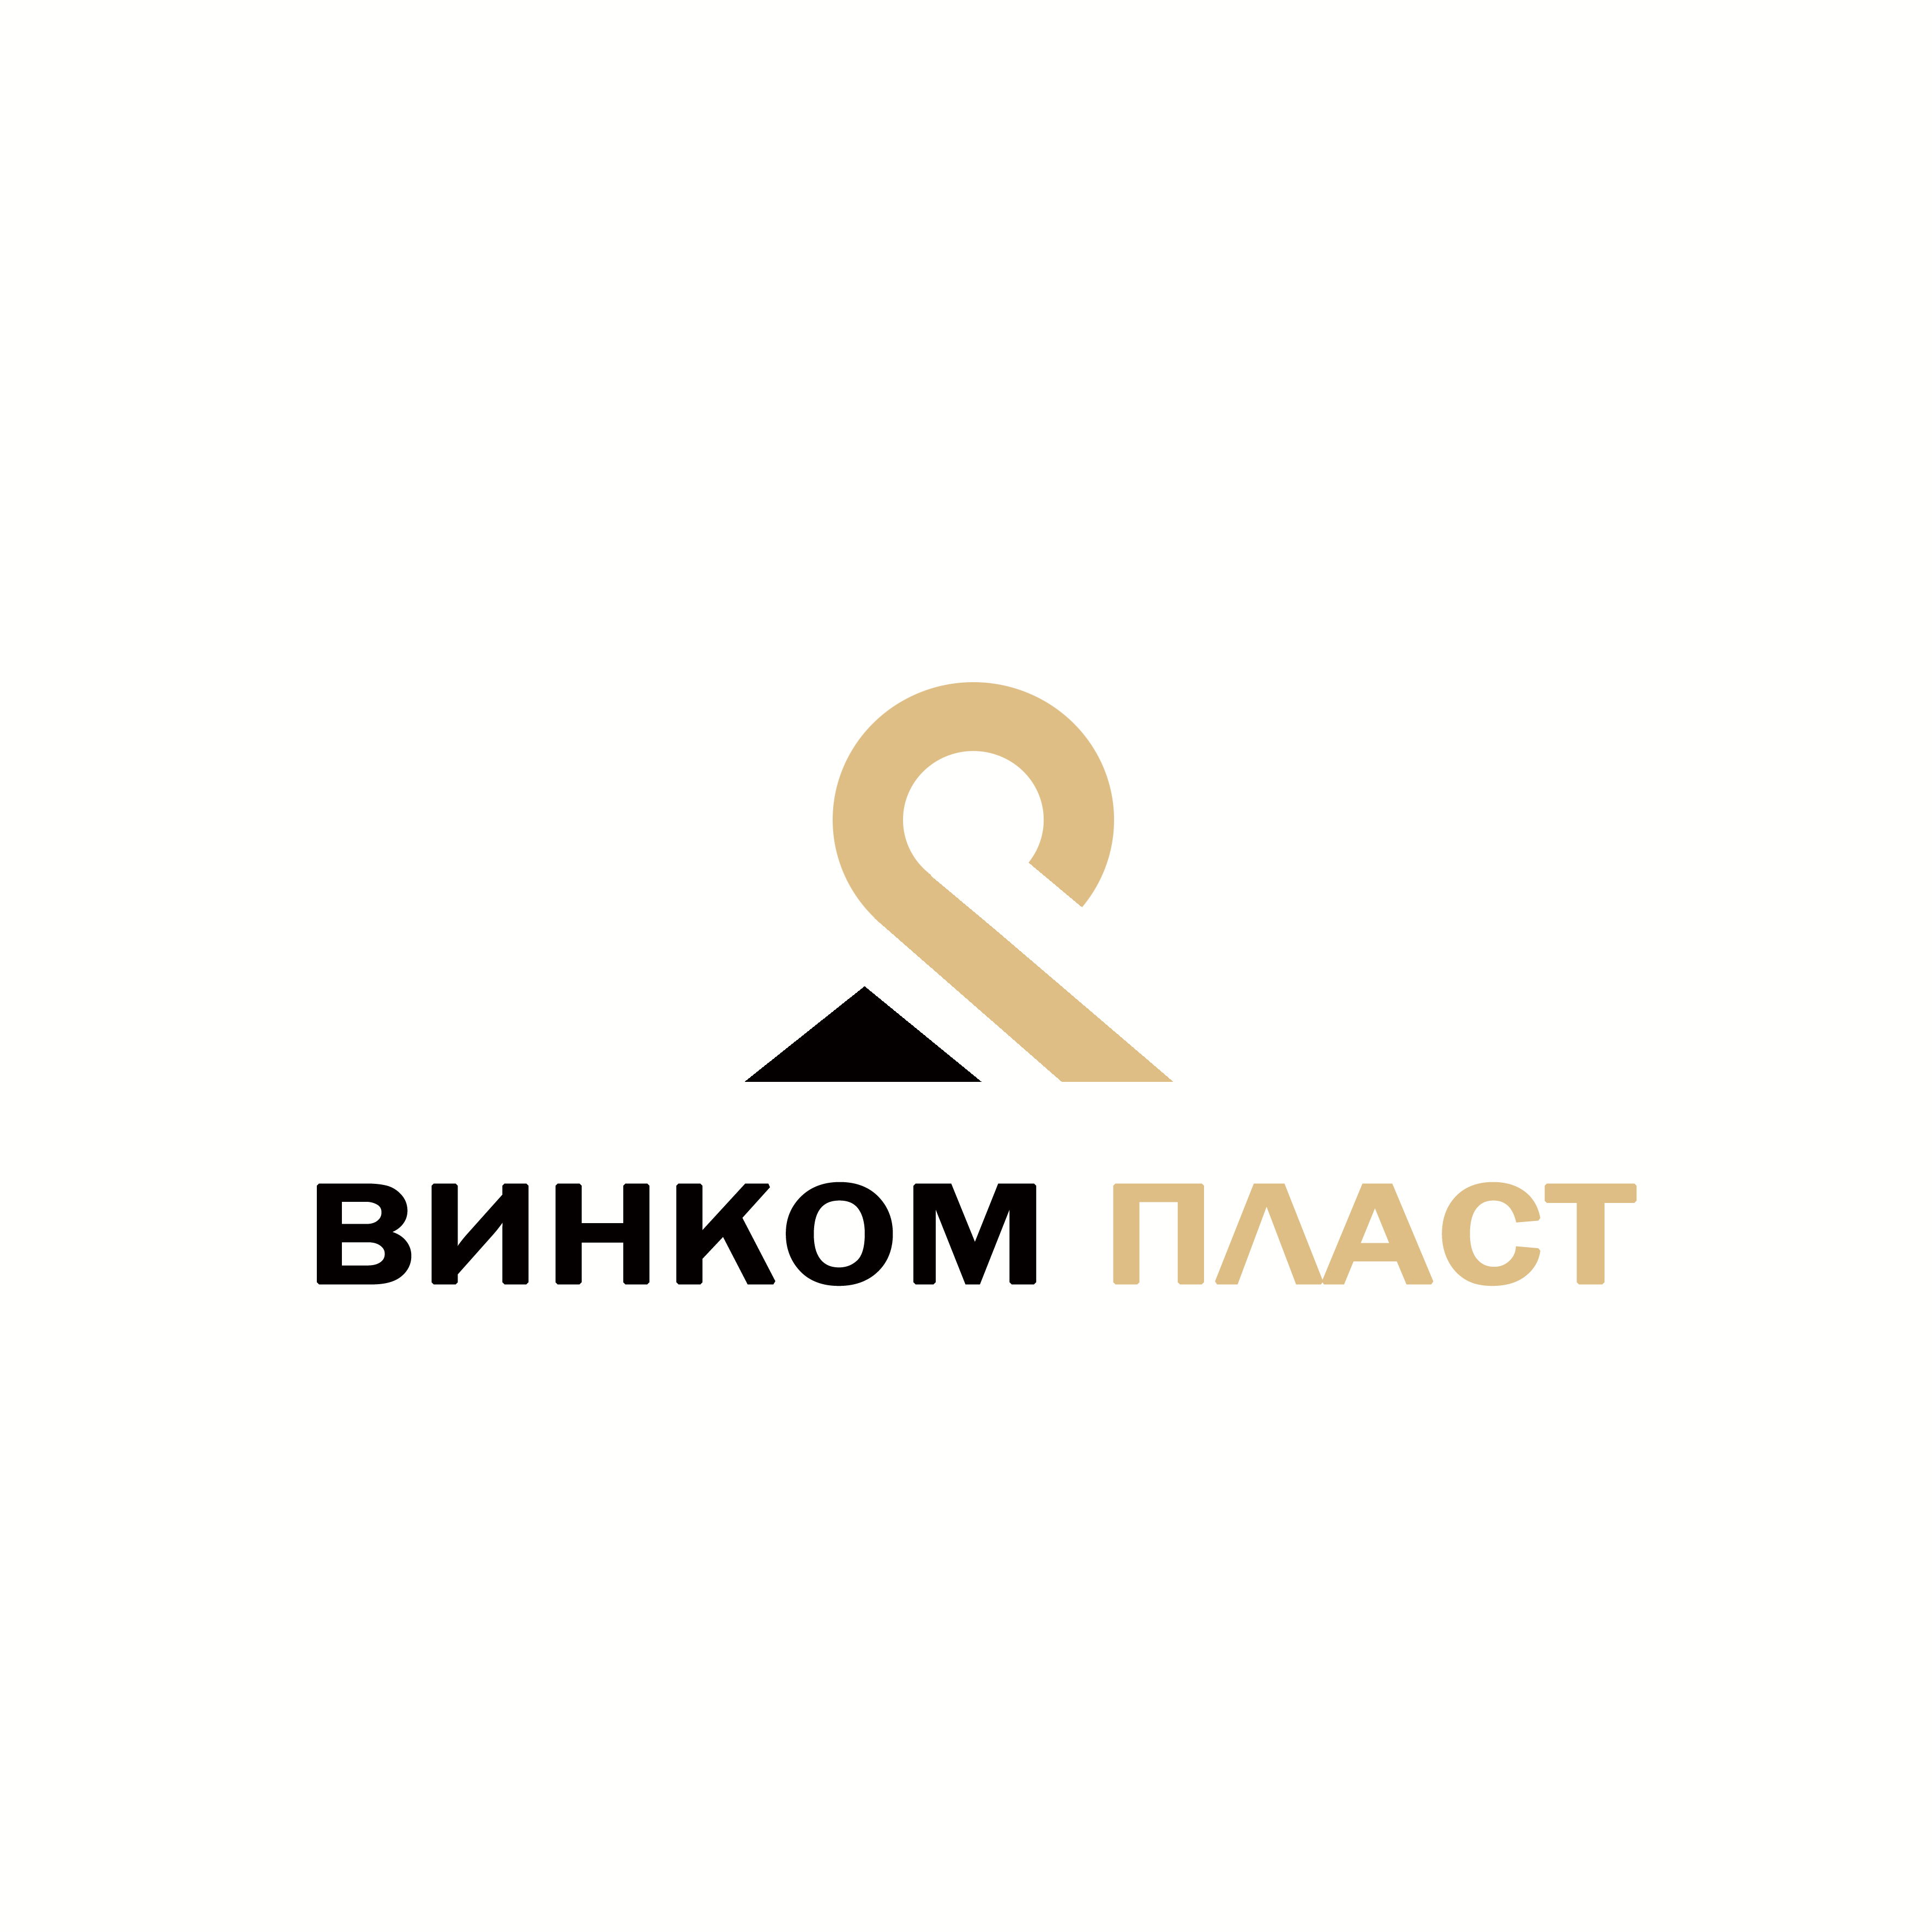 Логотип, фавикон и визитка для компании Винком Пласт  фото f_6865c35ef767f232.jpg